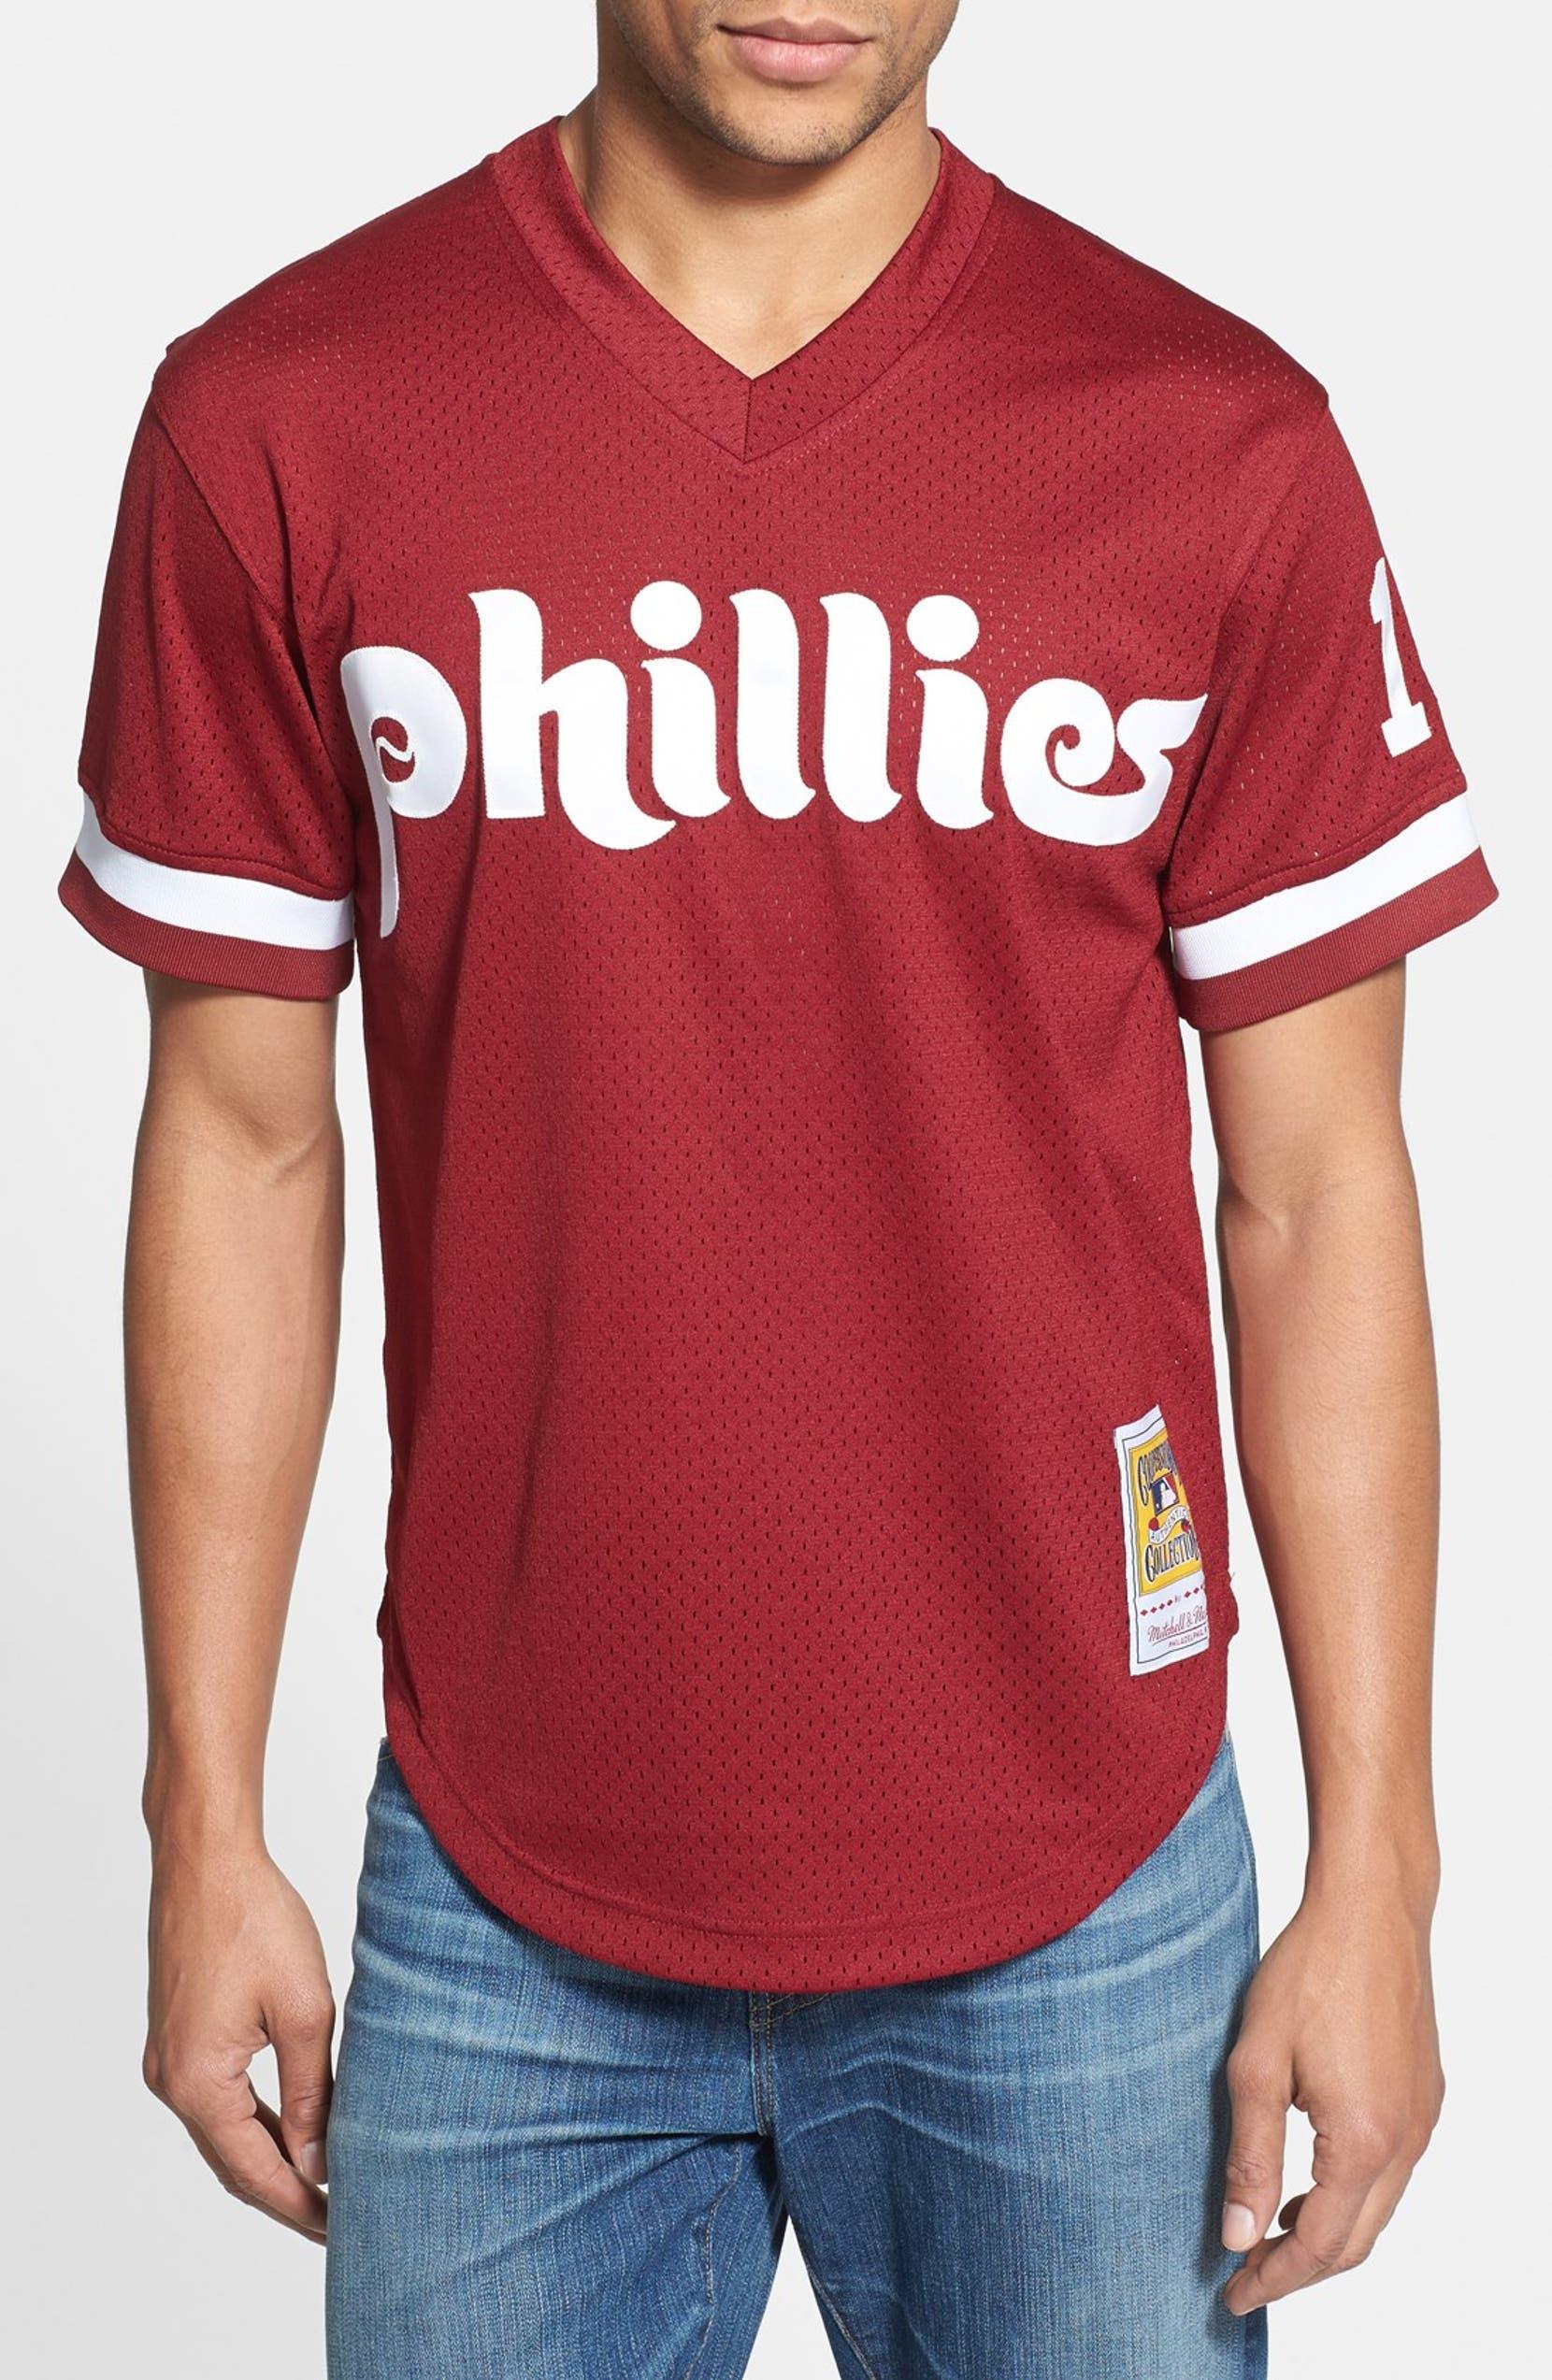 pretty nice 5ee97 724a8 Mitchell & Ness 'Darren Daulton - Philadelphia Phillies ...